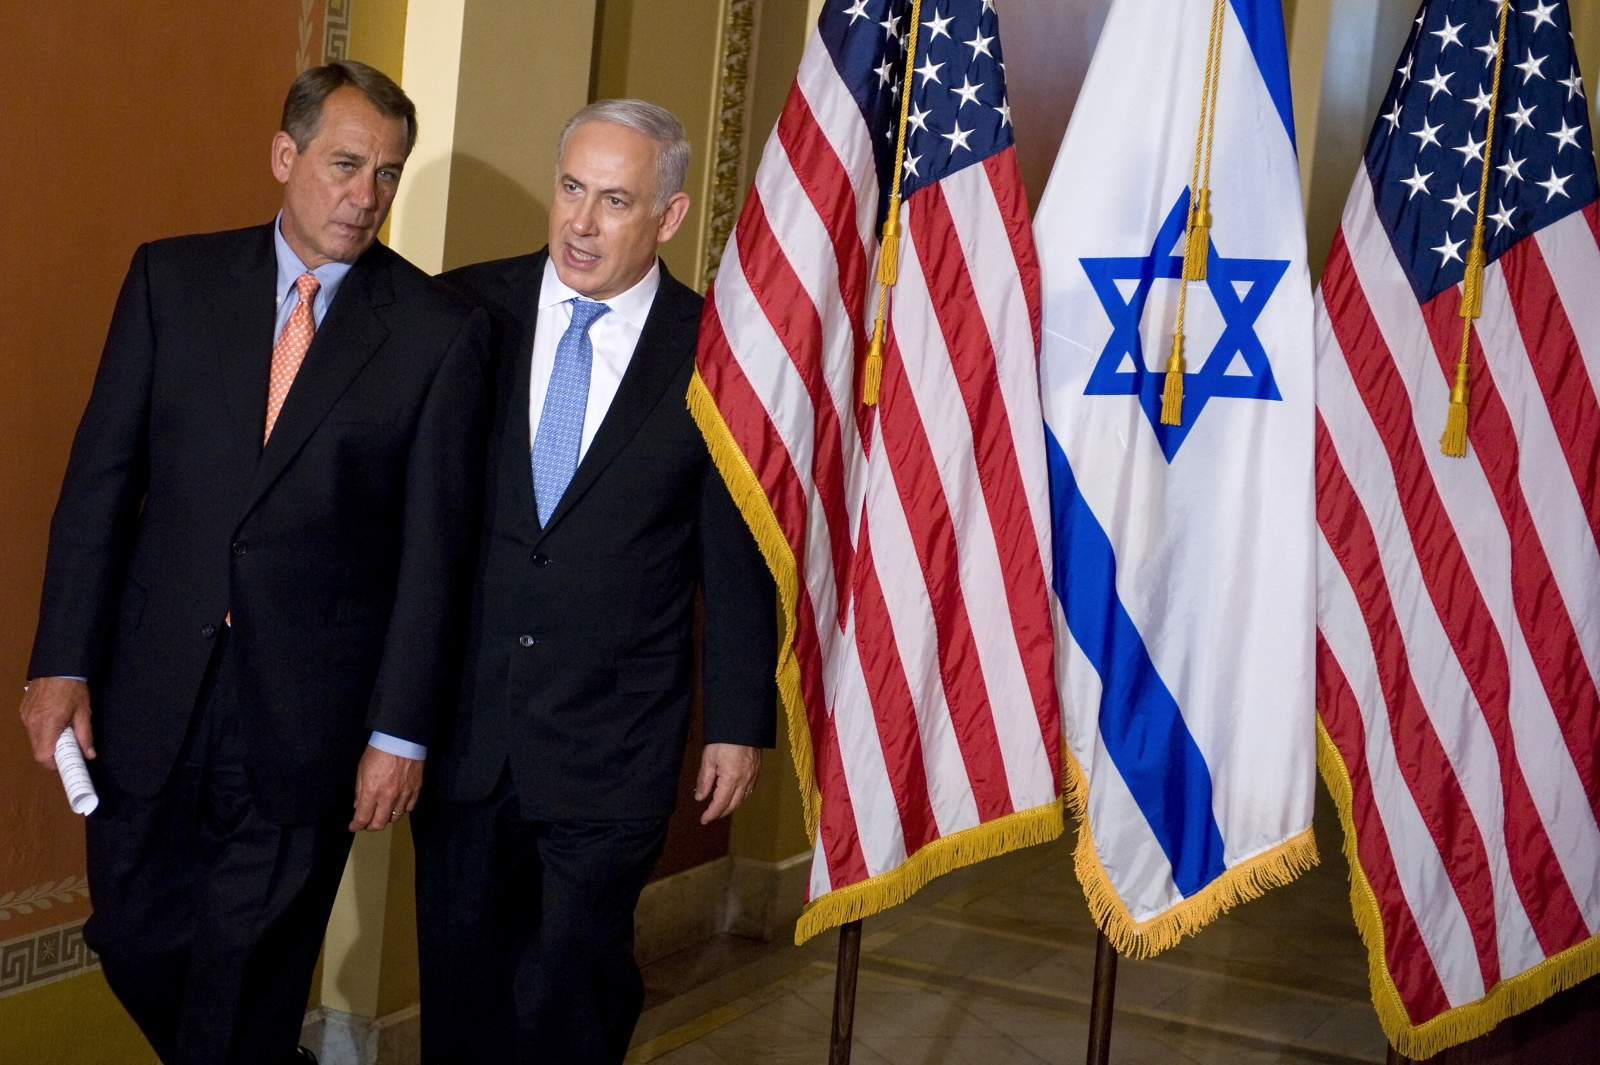 John Boehner Benjamin Netanyahu